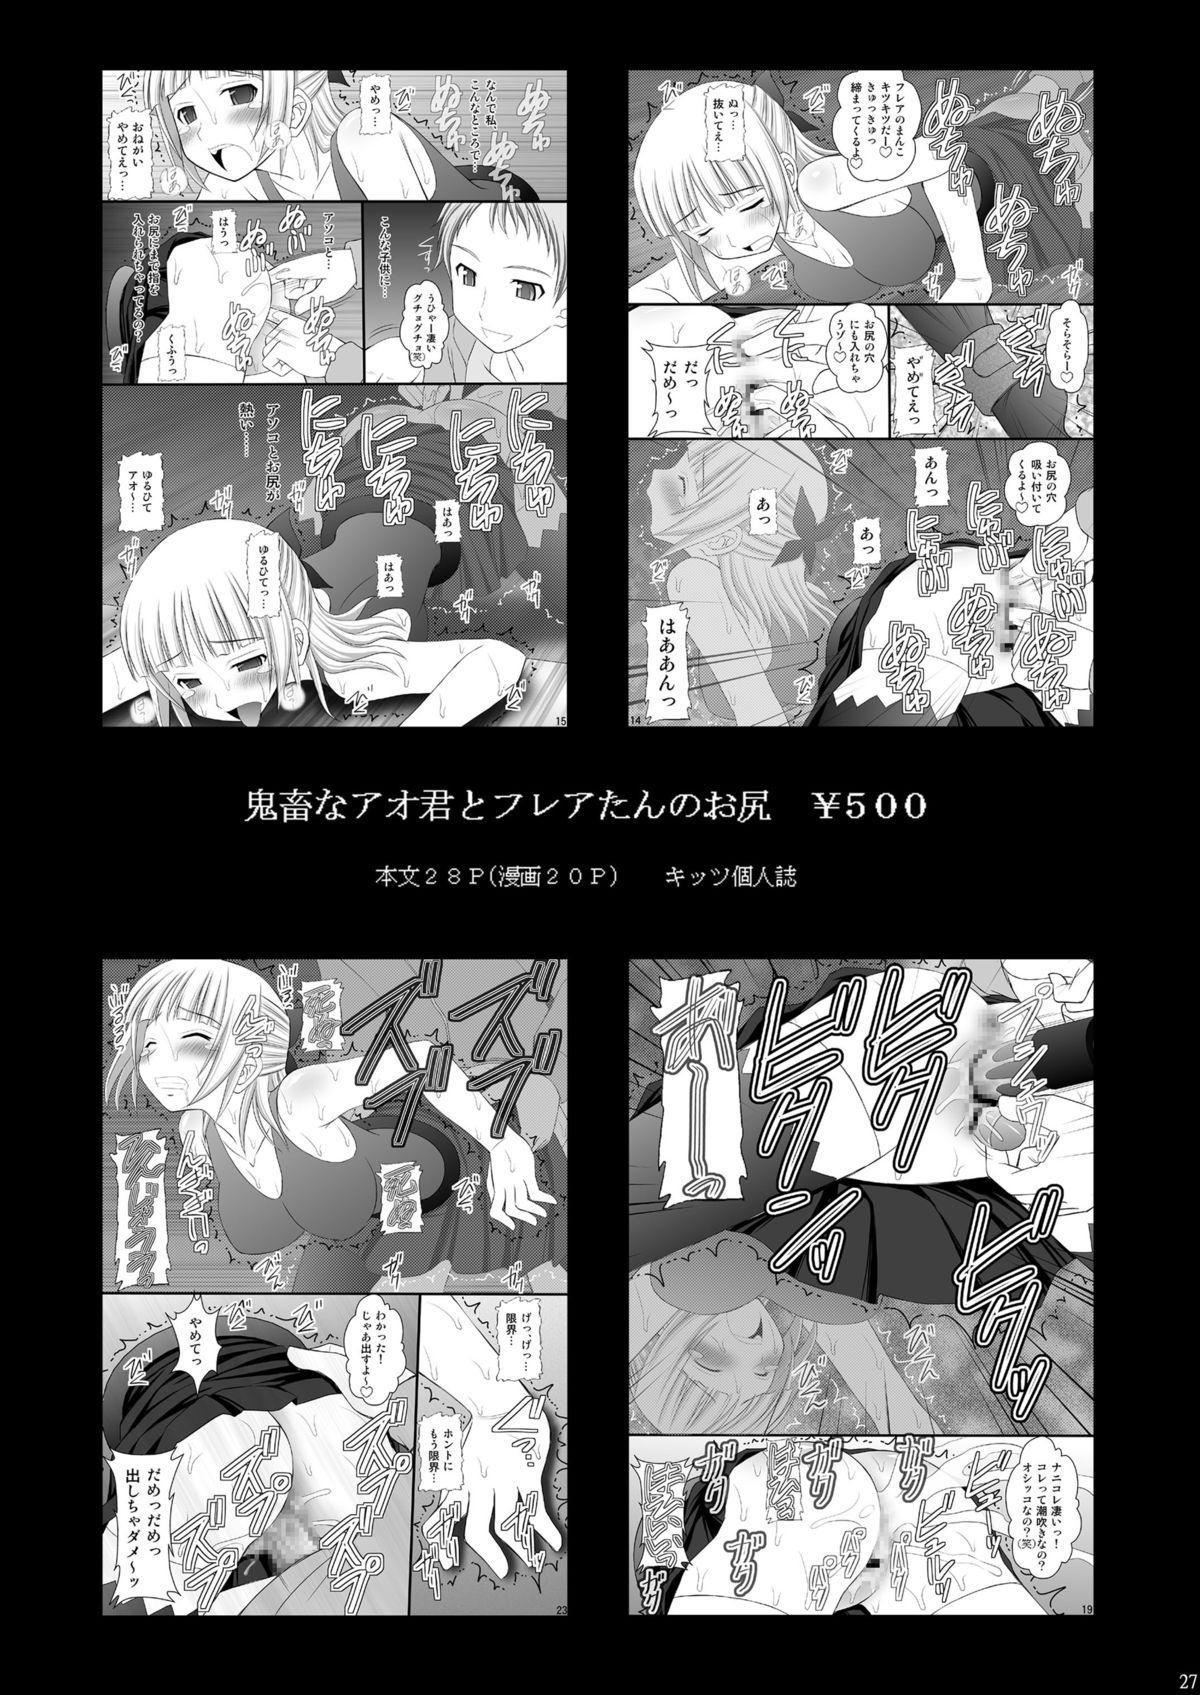 Toraware Hime I - System Master Nyaa Sakarae nee 25